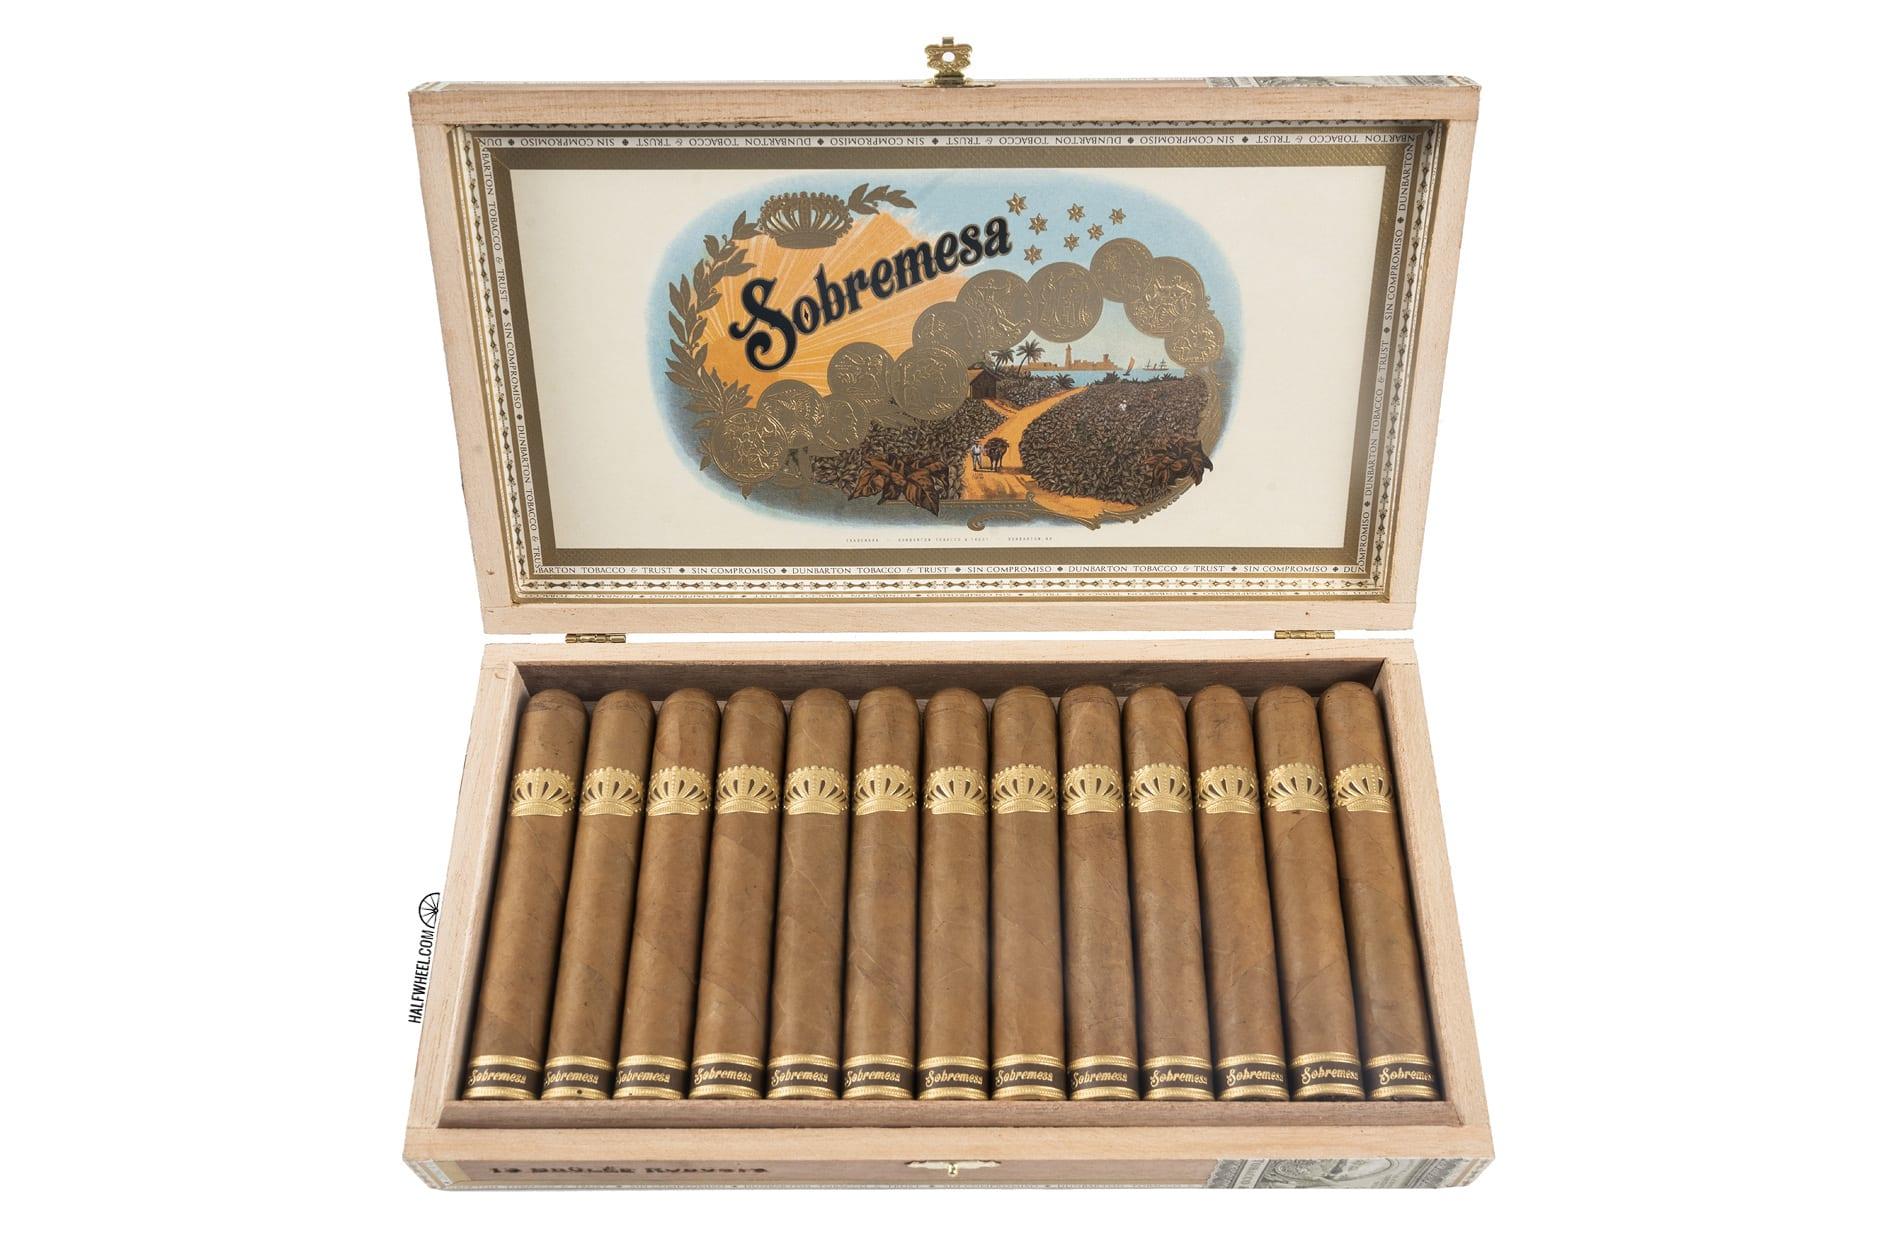 Dunbarton Tobacco & Trust Releasing Sweet-Tipped Sobremesa Brûlée Featured Image